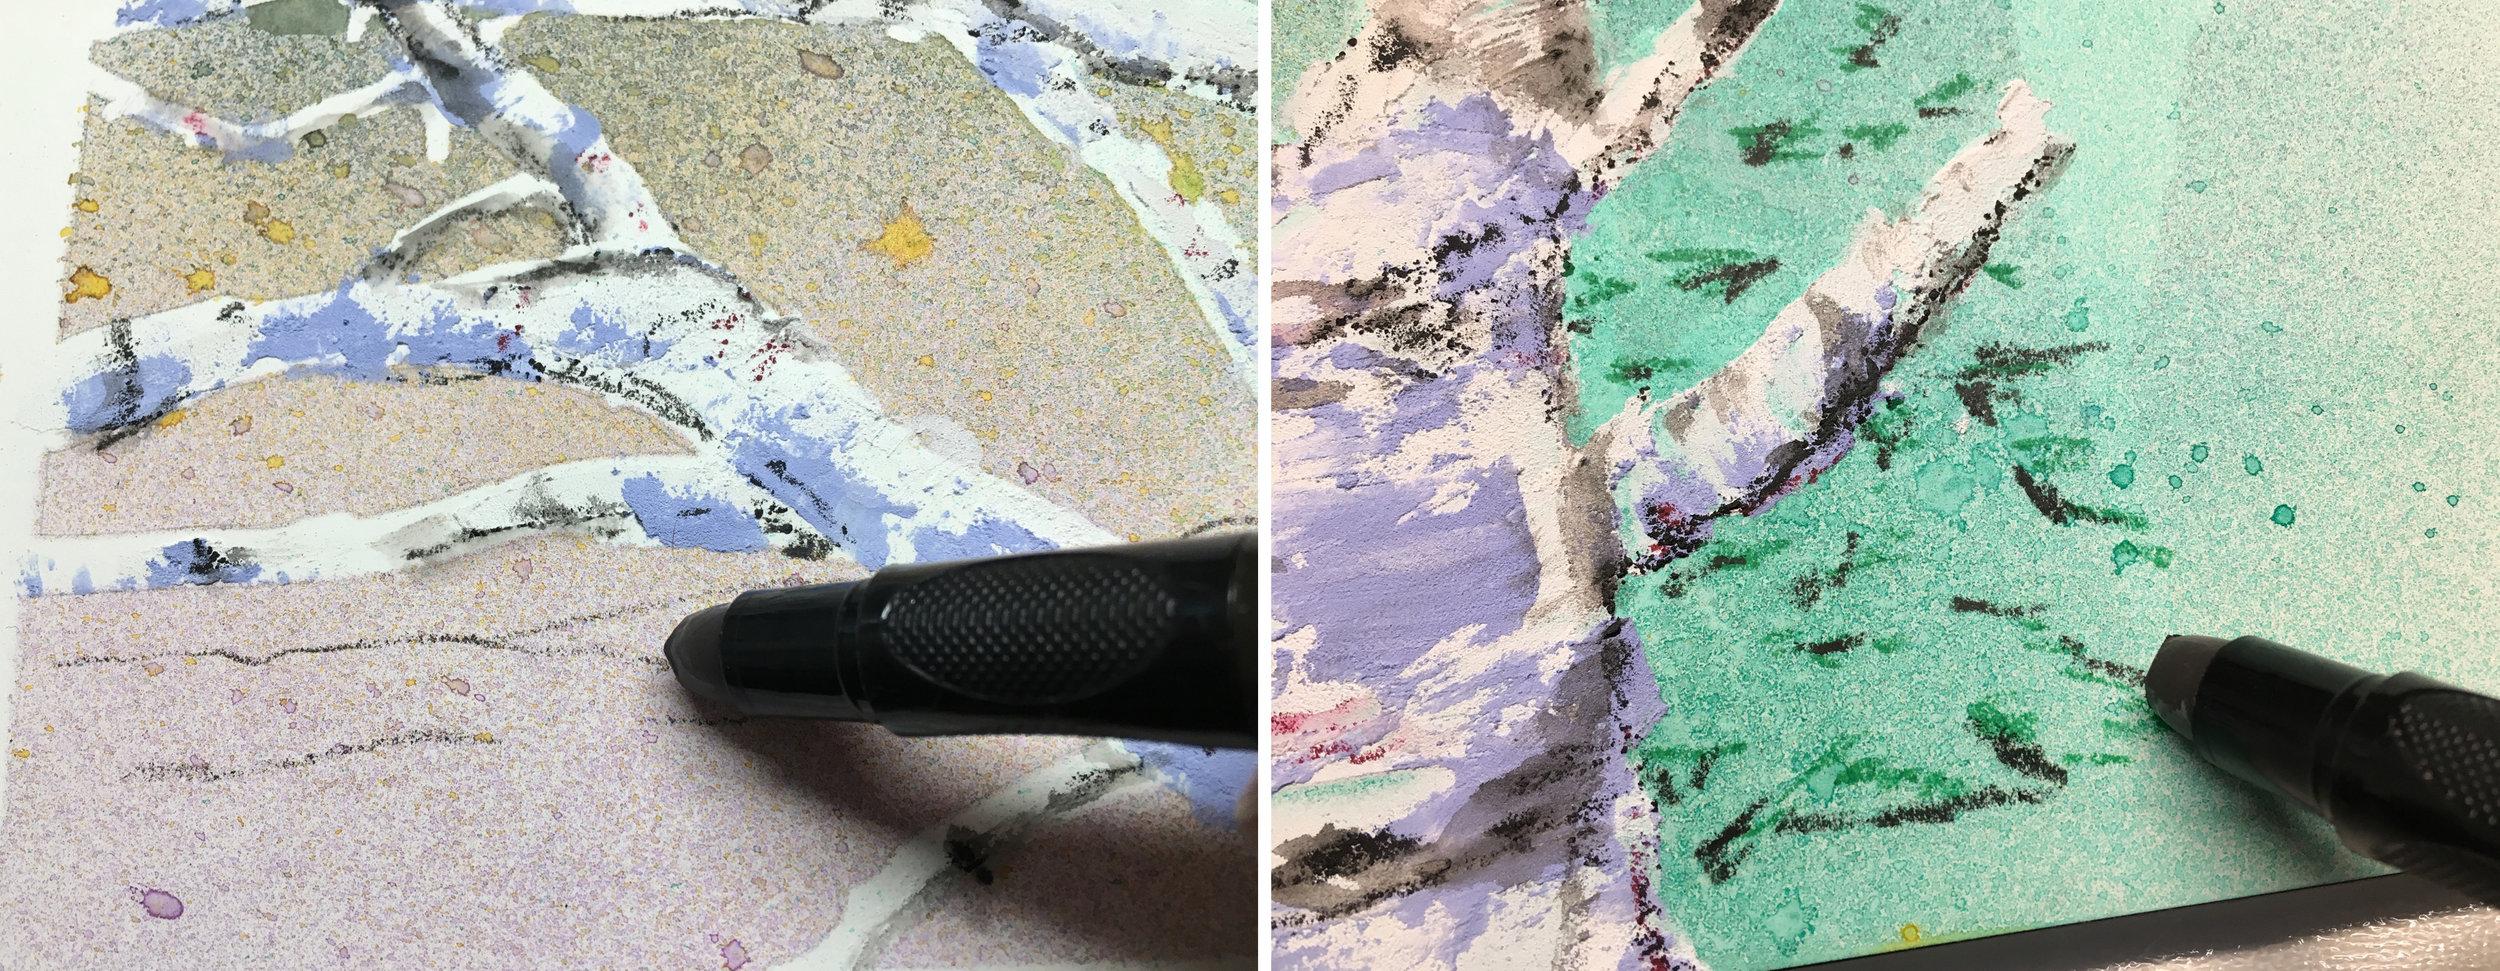 Marabu-Art-Crayon-details